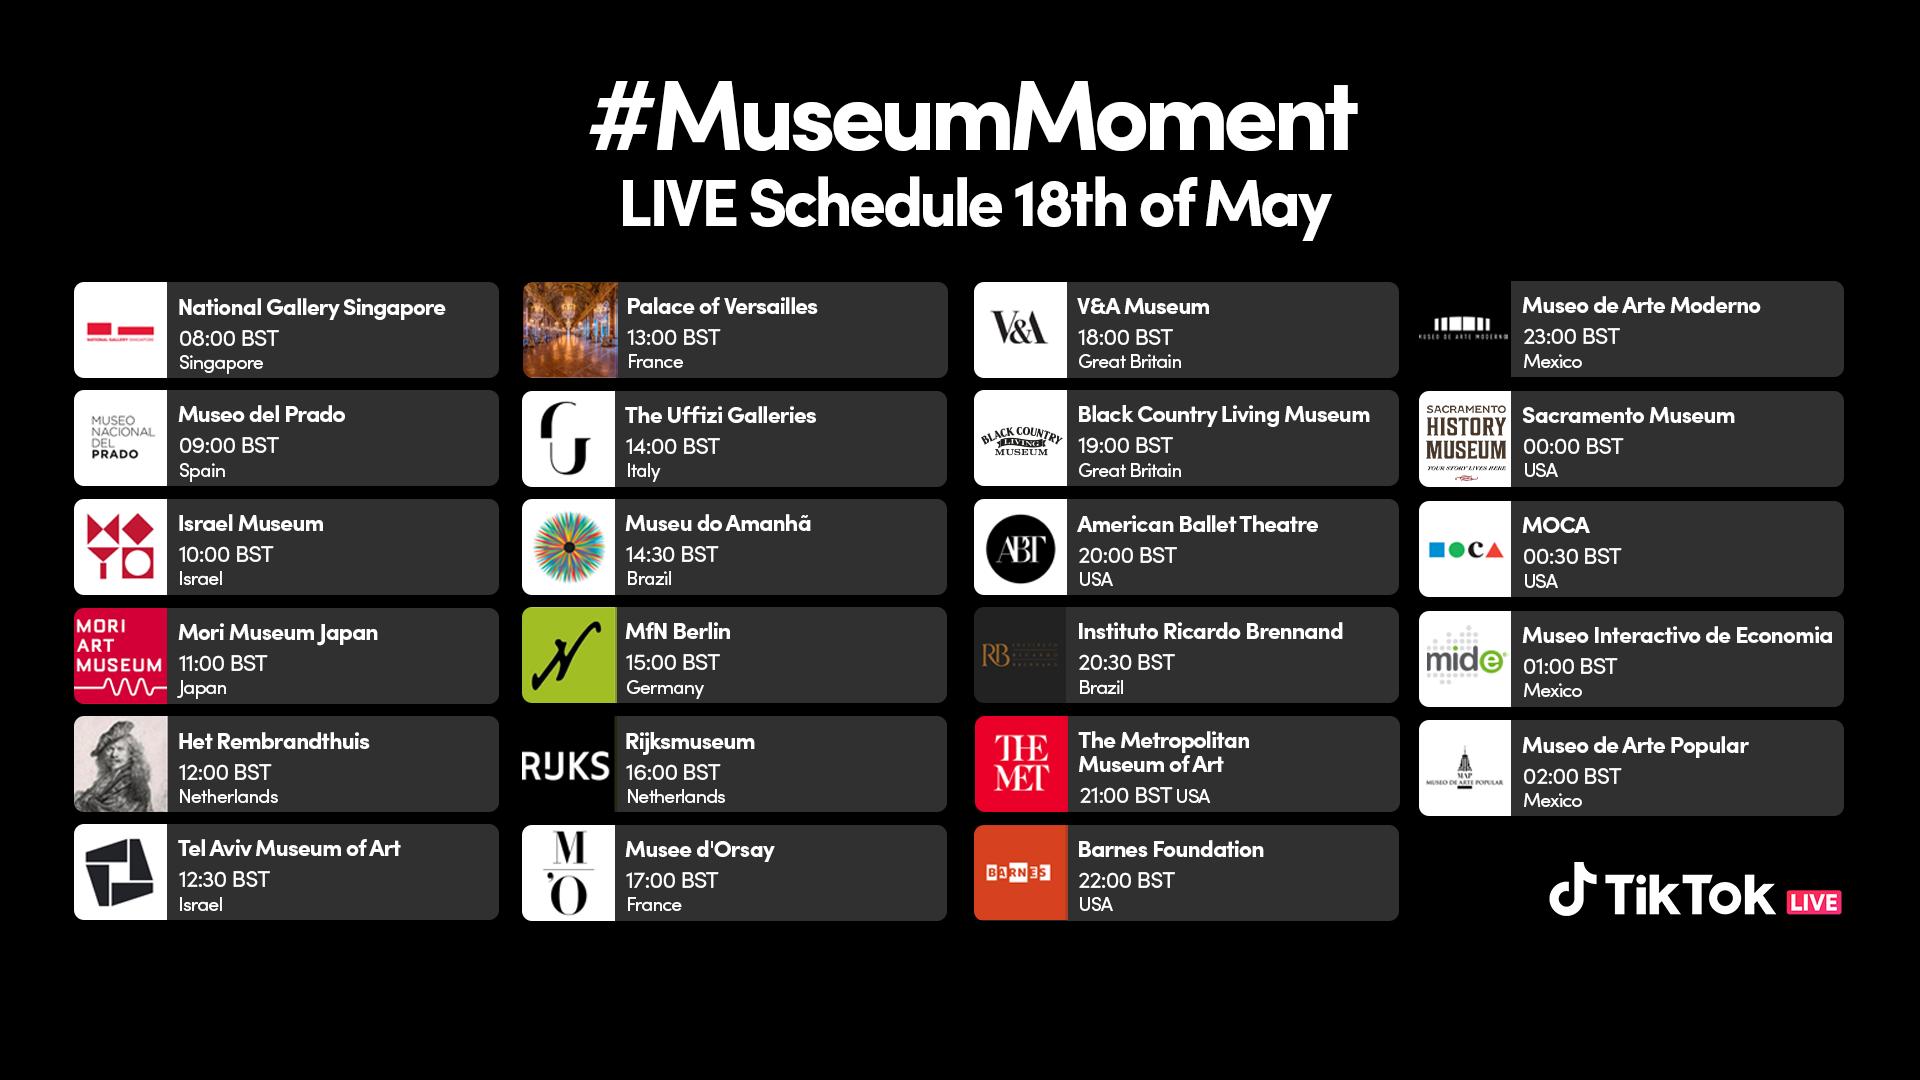 MuseumMoment: TikTok hosts its first-ever global LIVE museum marathon |  TikTok Newsroom